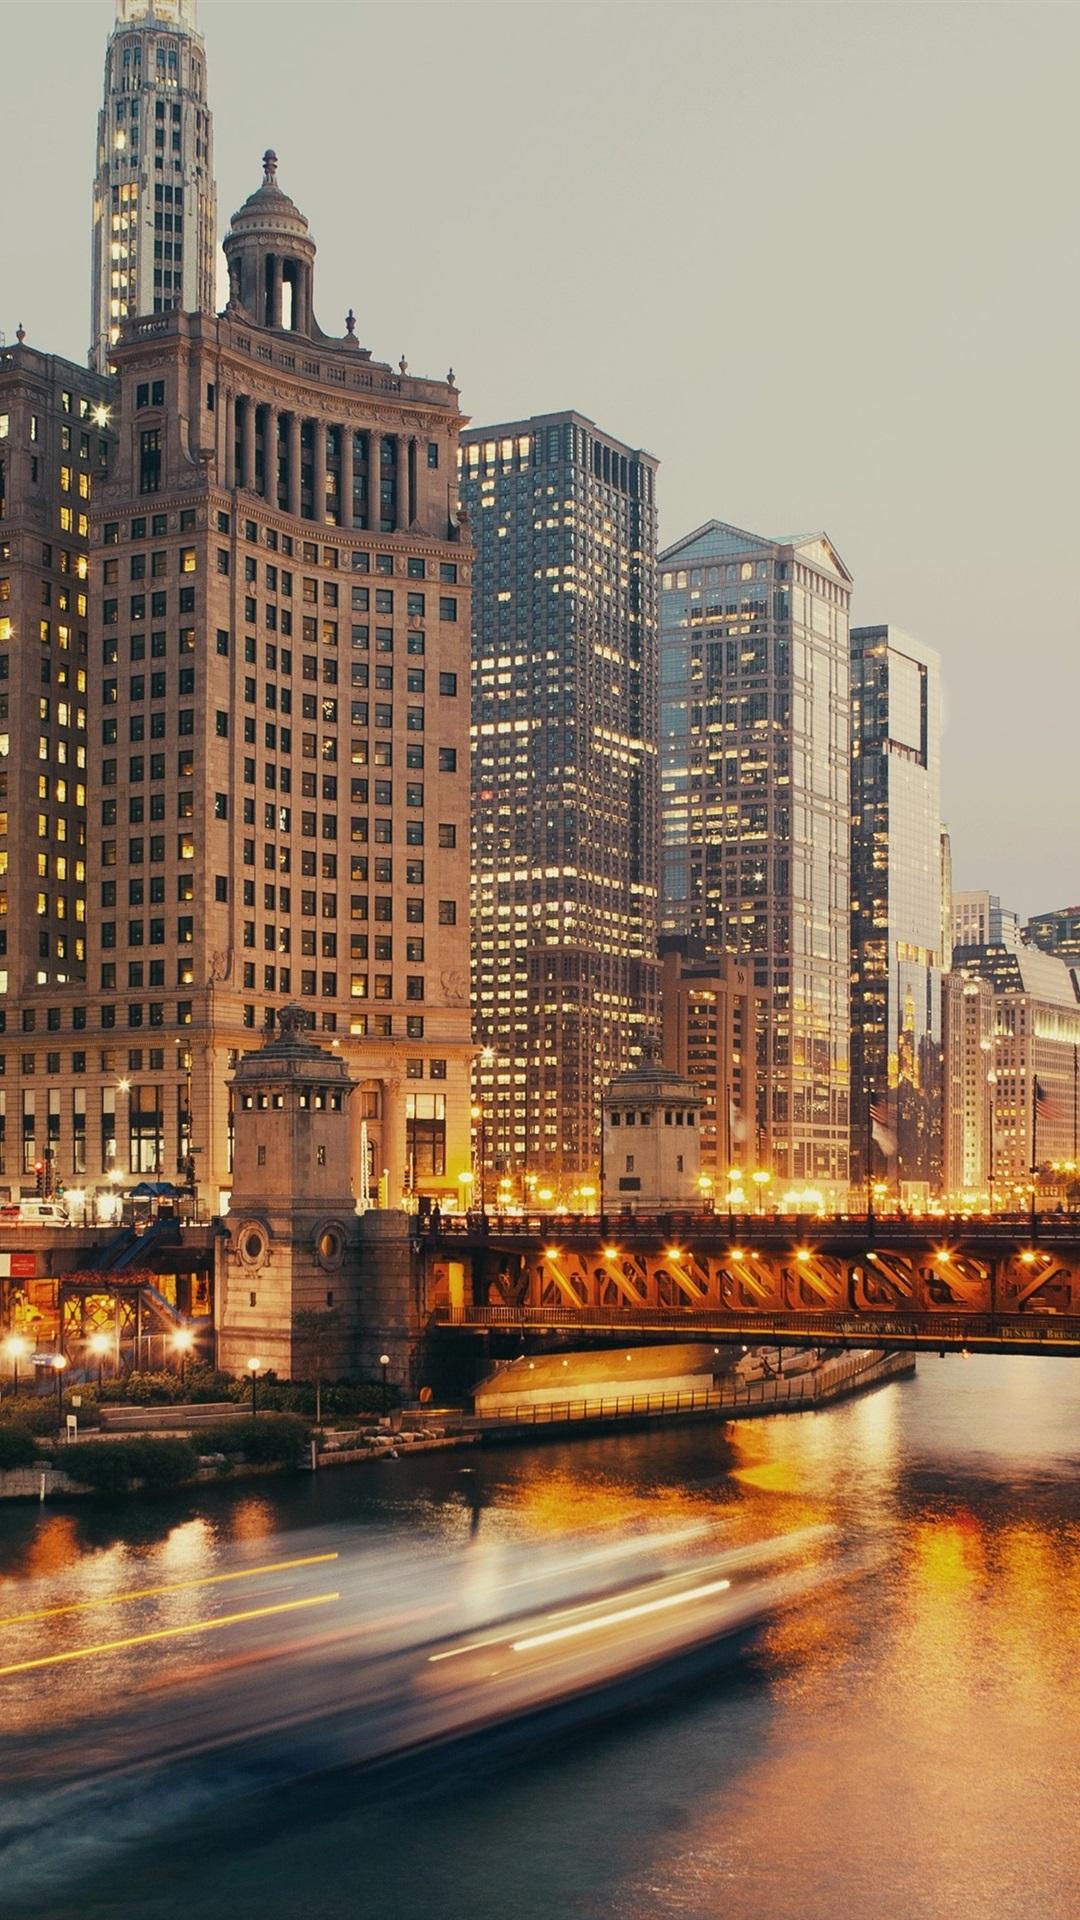 Chicago Skyscrapers Bridge River Boats Lights 1080x1920